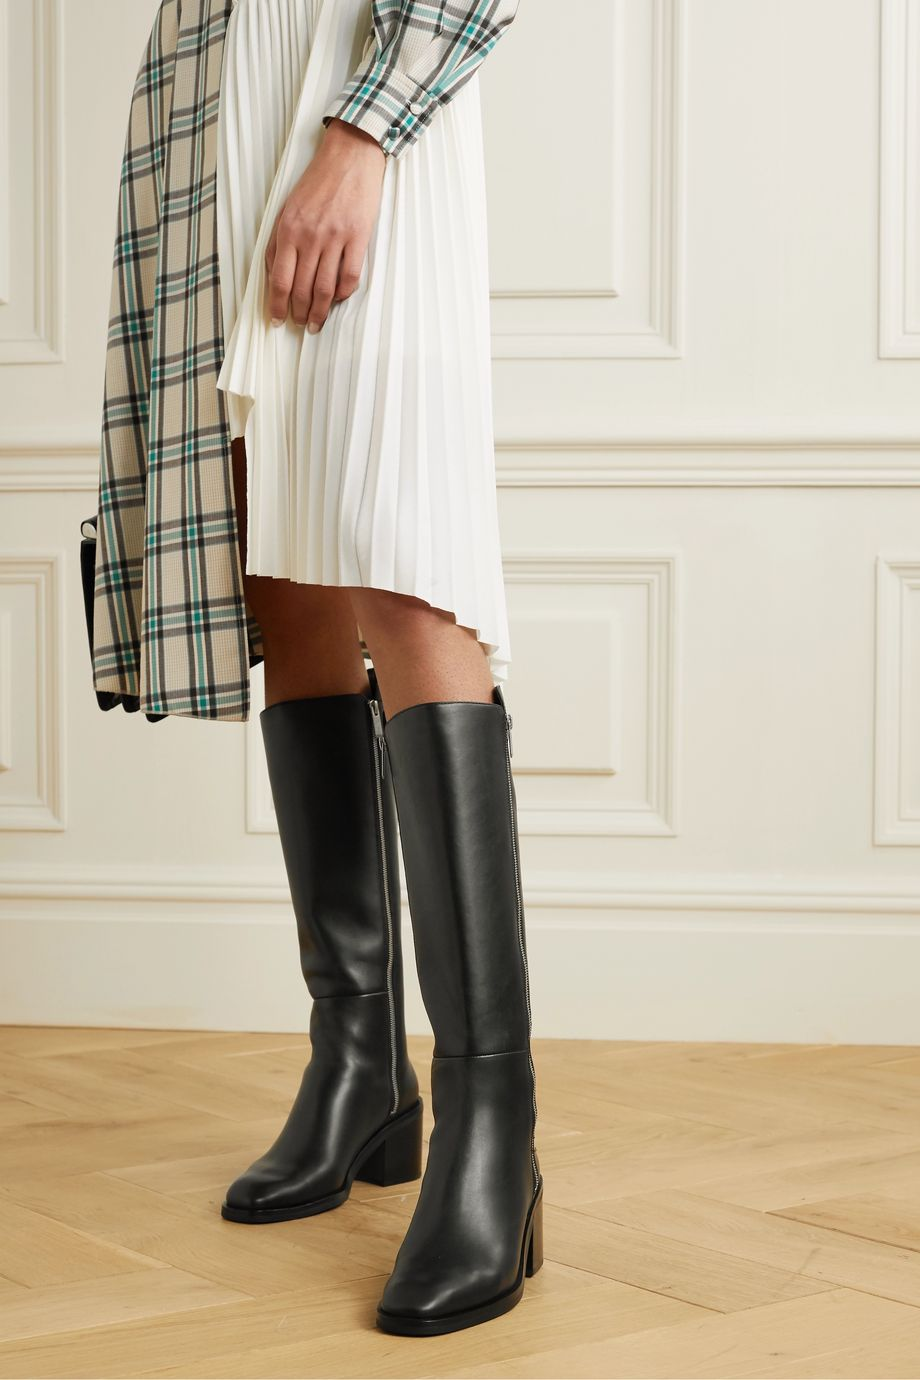 3.1 Phillip Lim Alexa leather knee boots